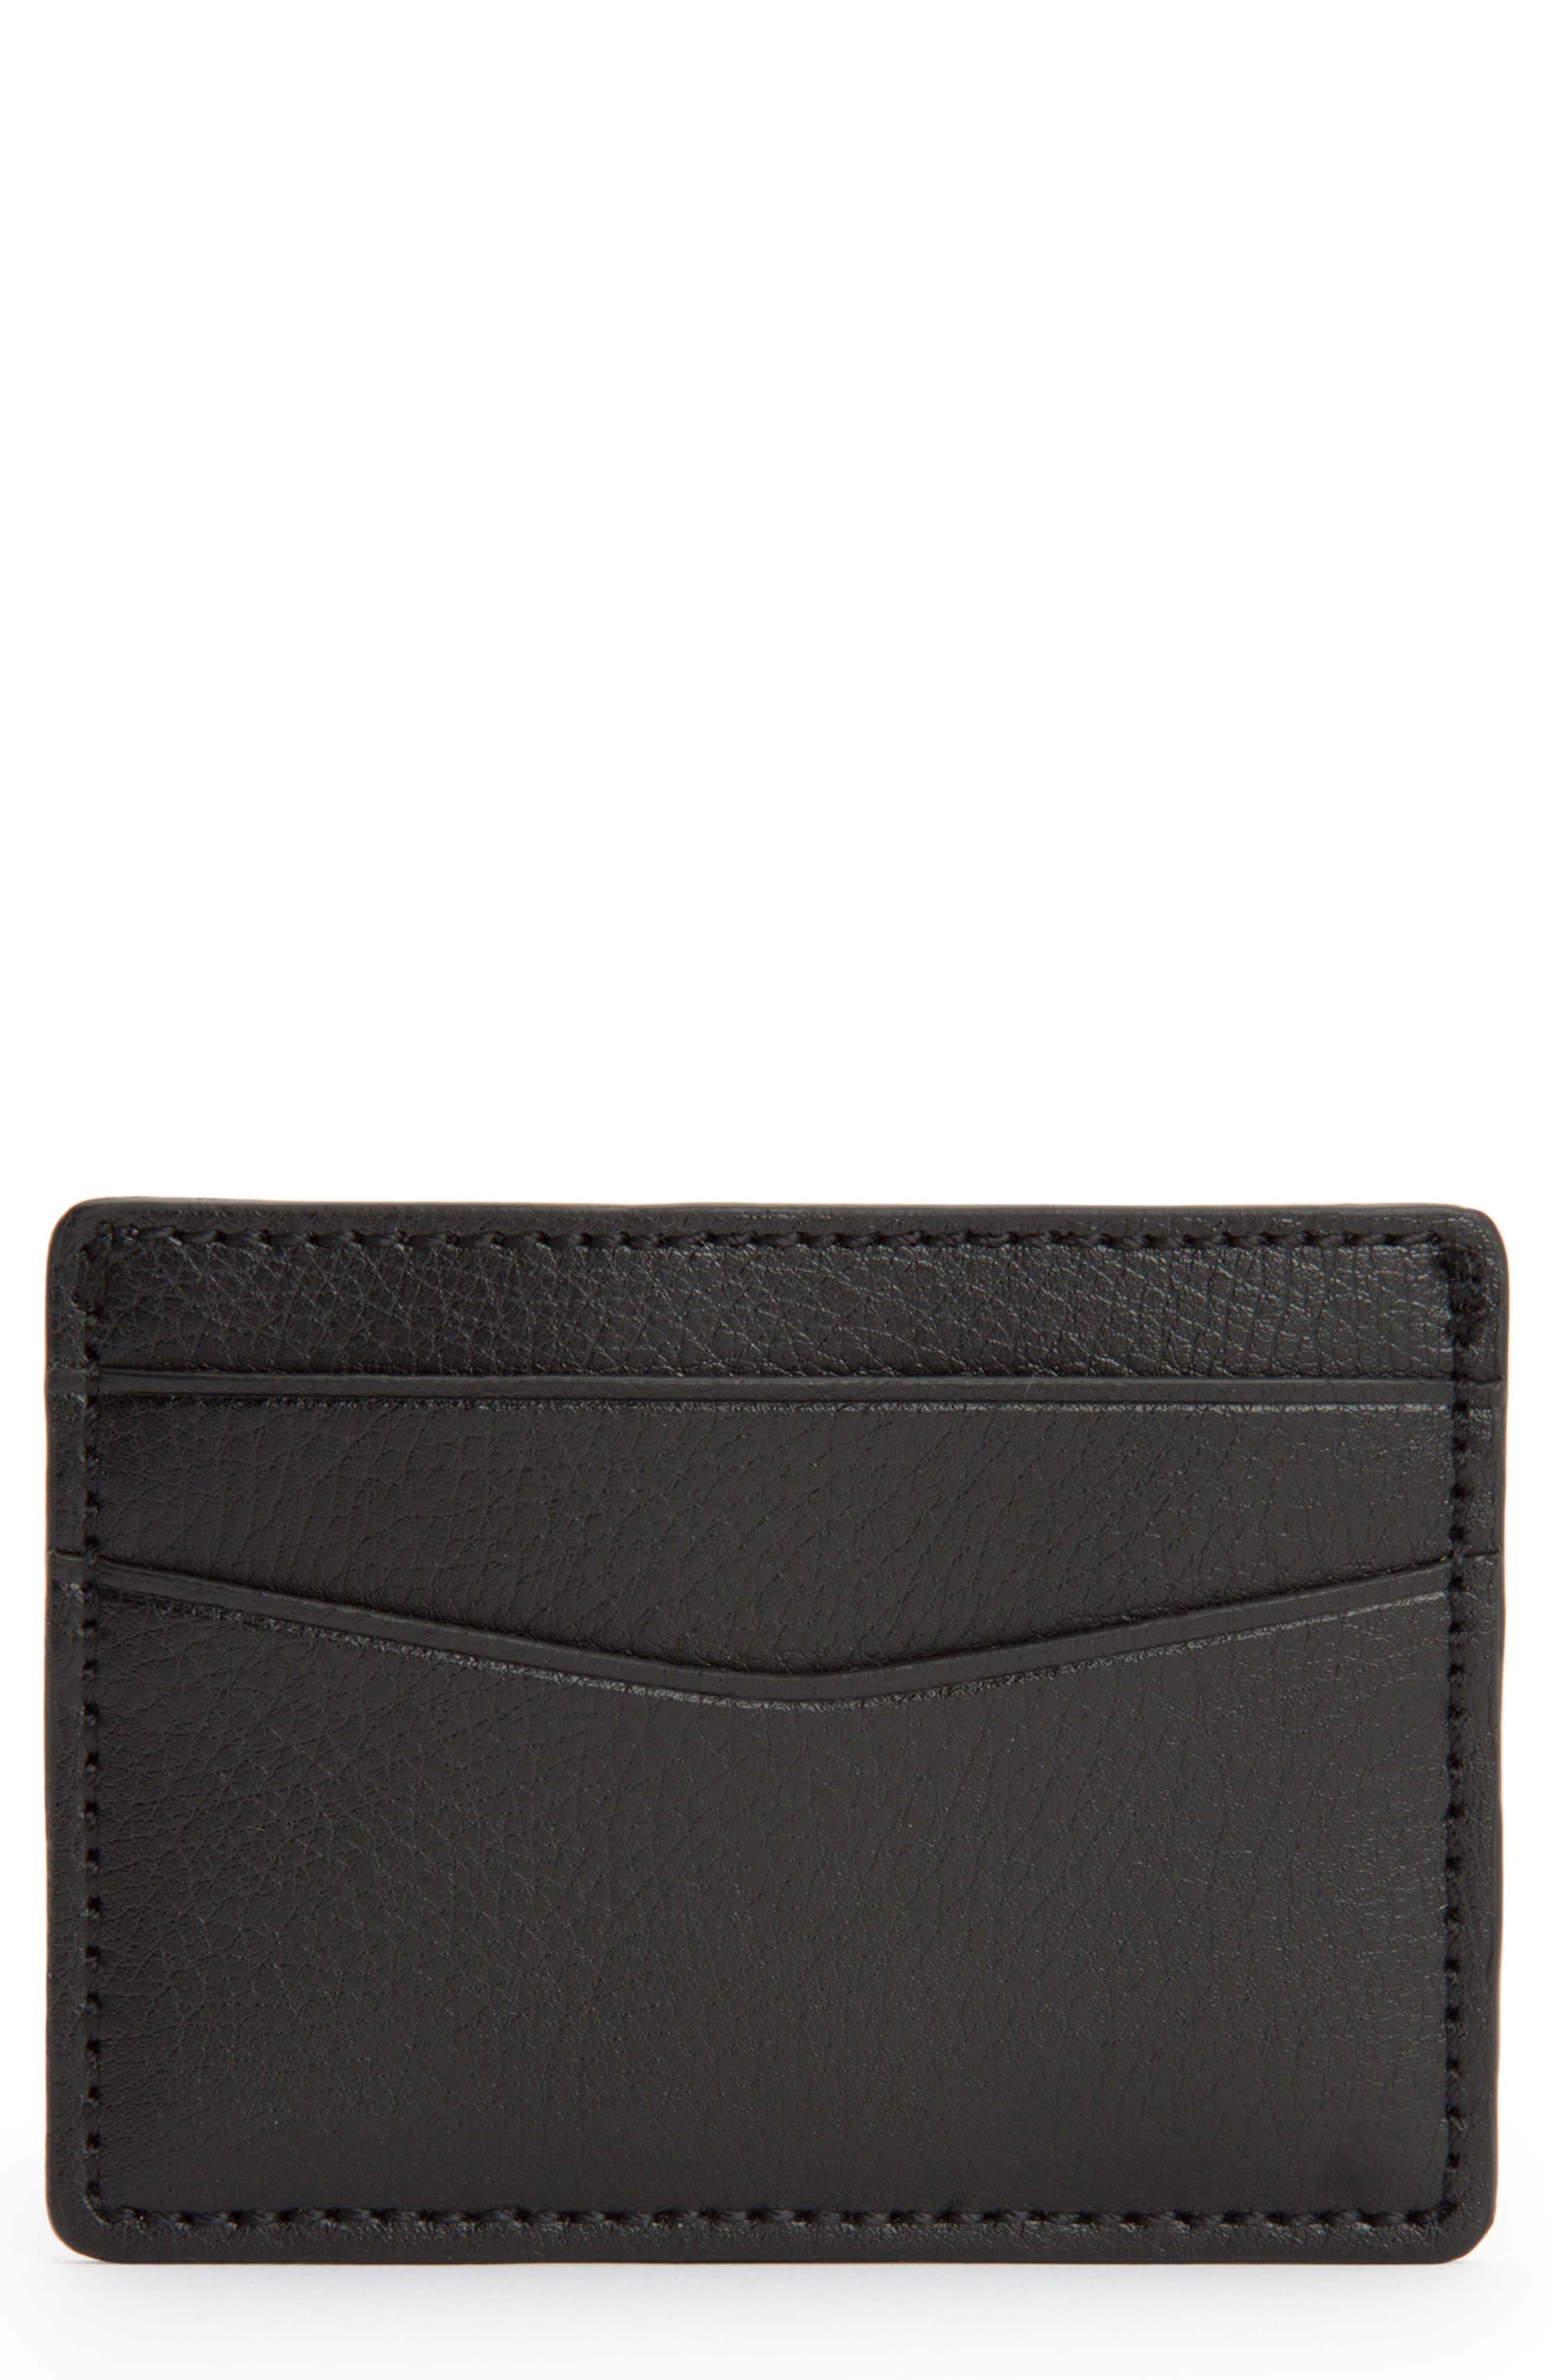 Blake Card Case,                         Main,                         color, BLACK